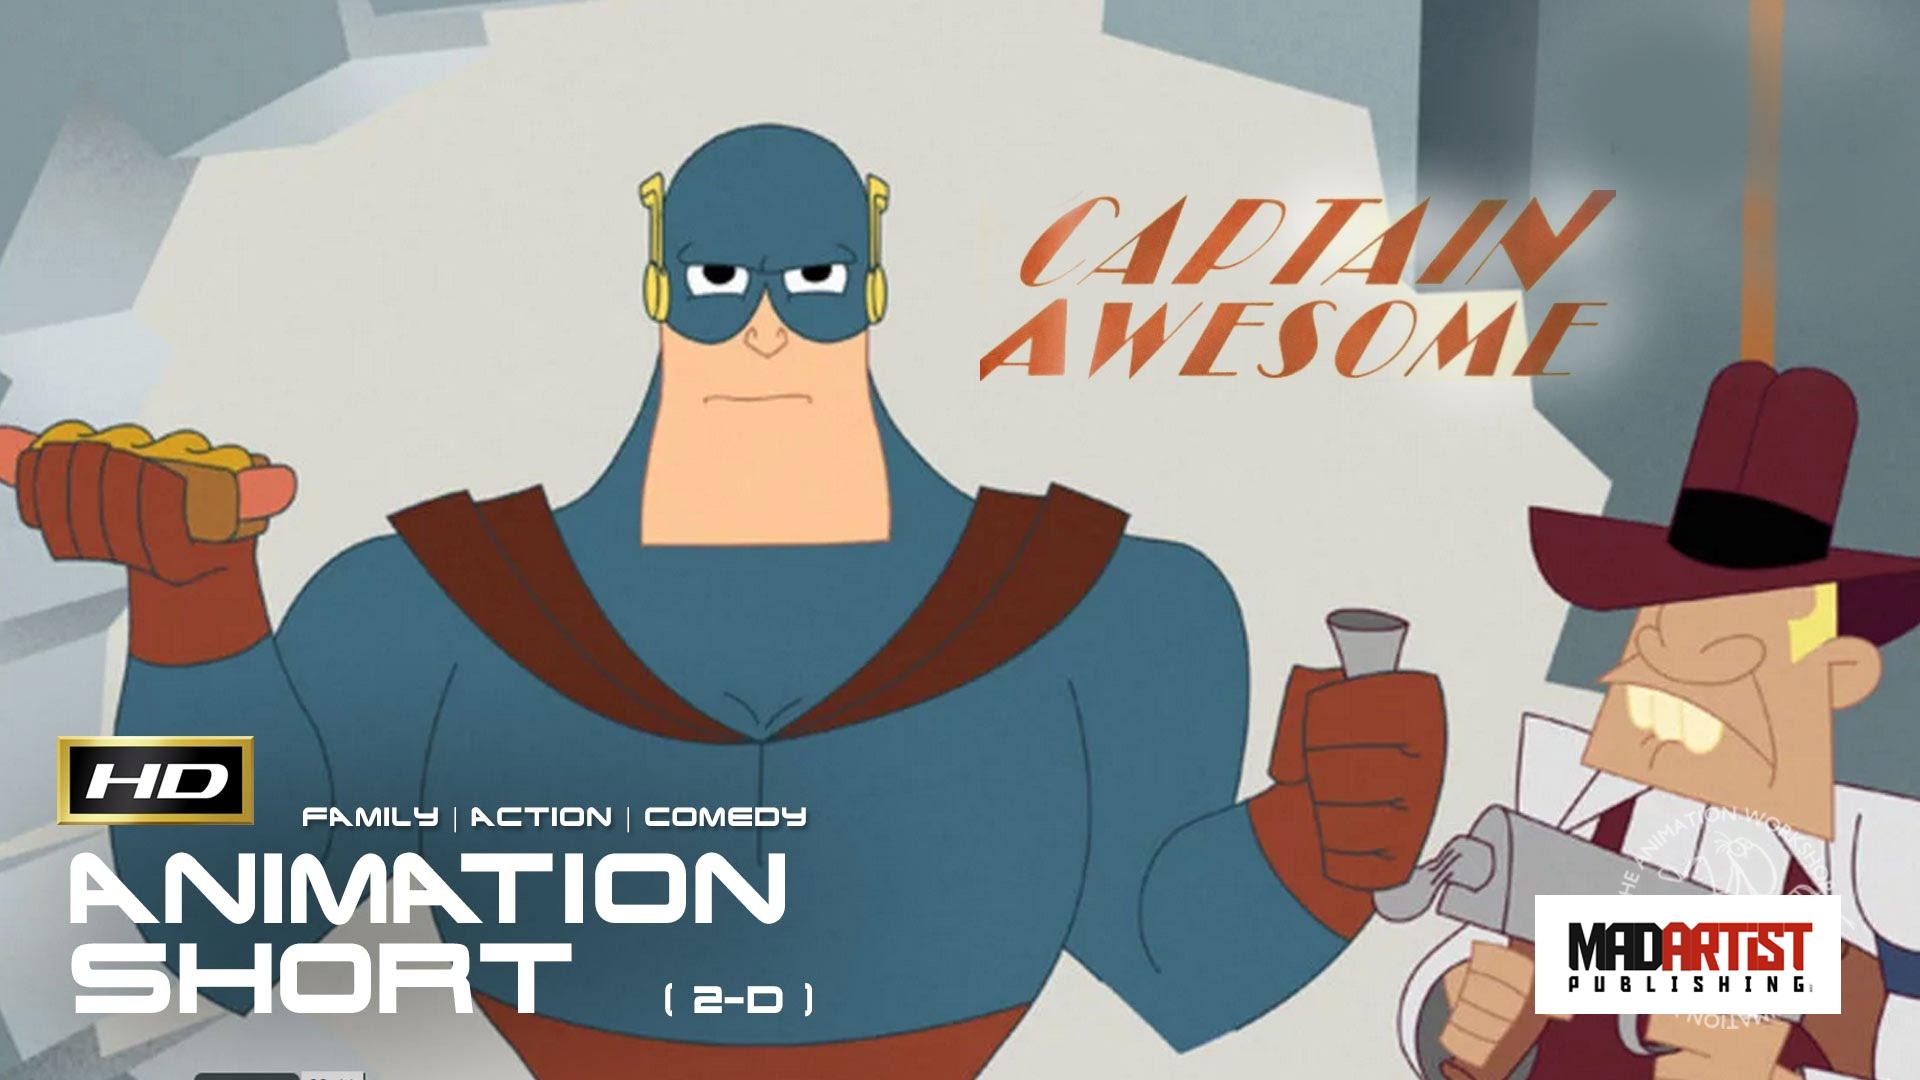 cgi animation examples